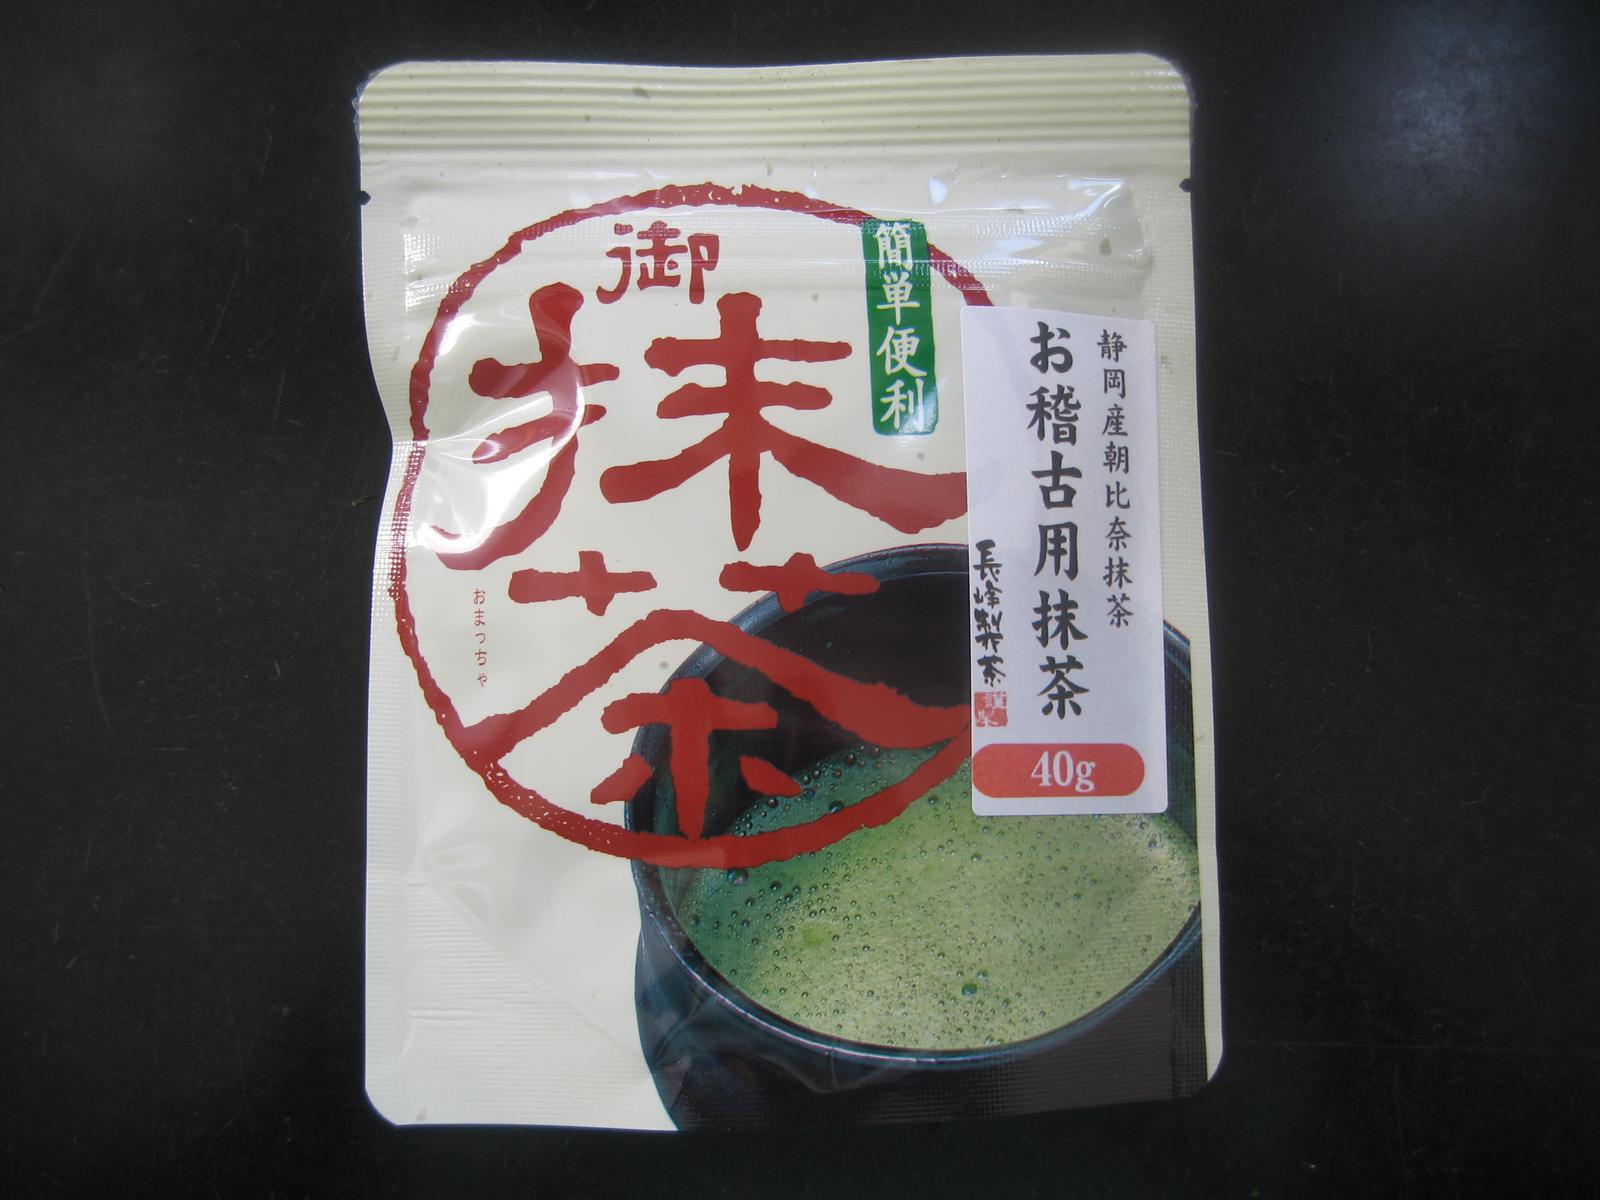 Shizuoka industrial Asahina Matcha green tea lessons for green tea 40 g tea powder dish baking also